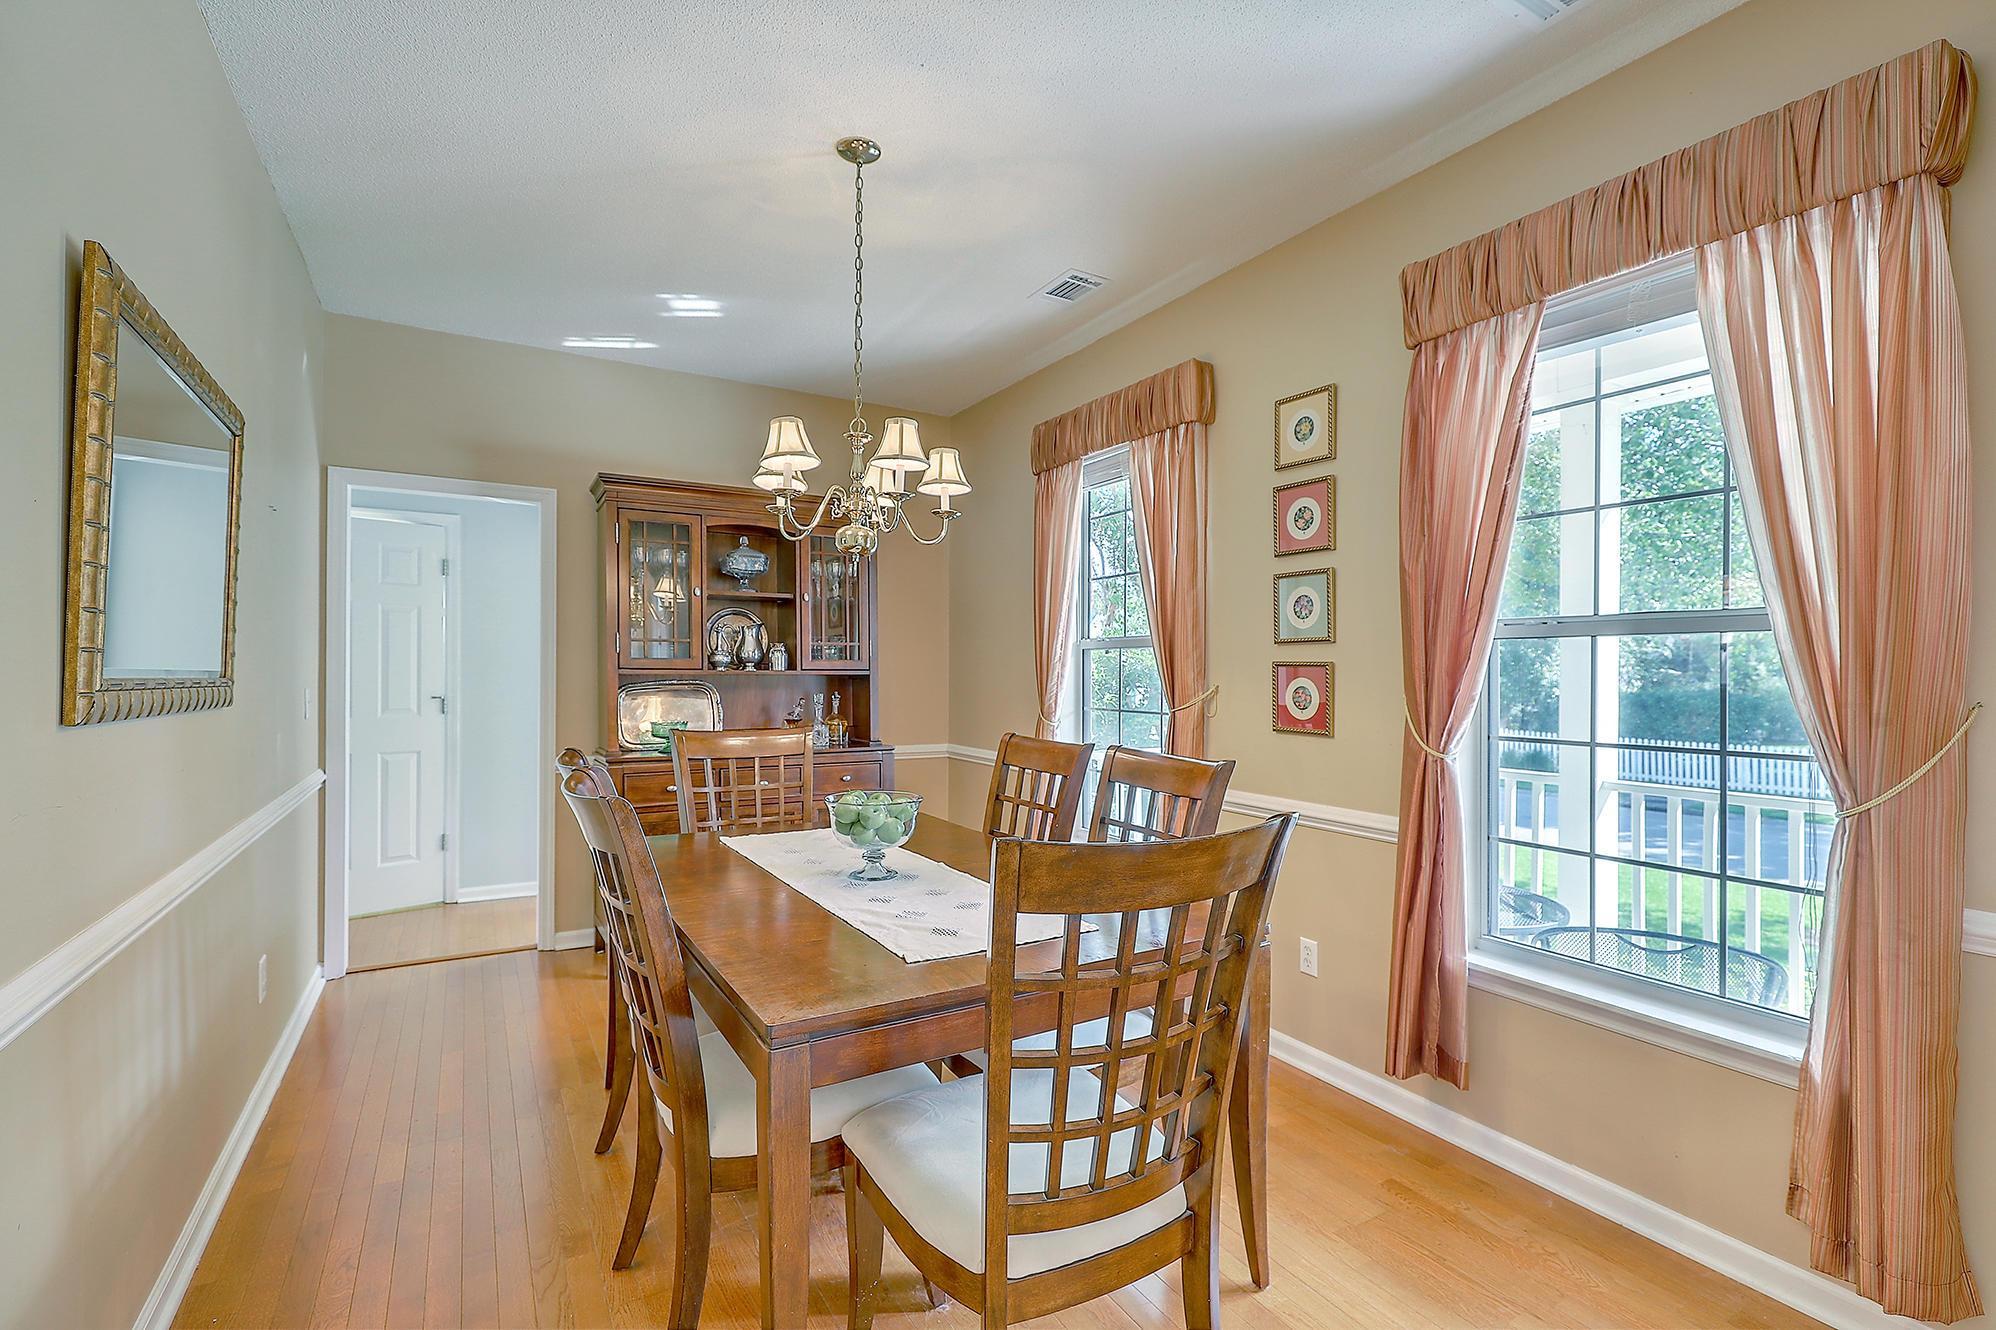 Belle Hall Homes For Sale - 106 Revolution, Mount Pleasant, SC - 37